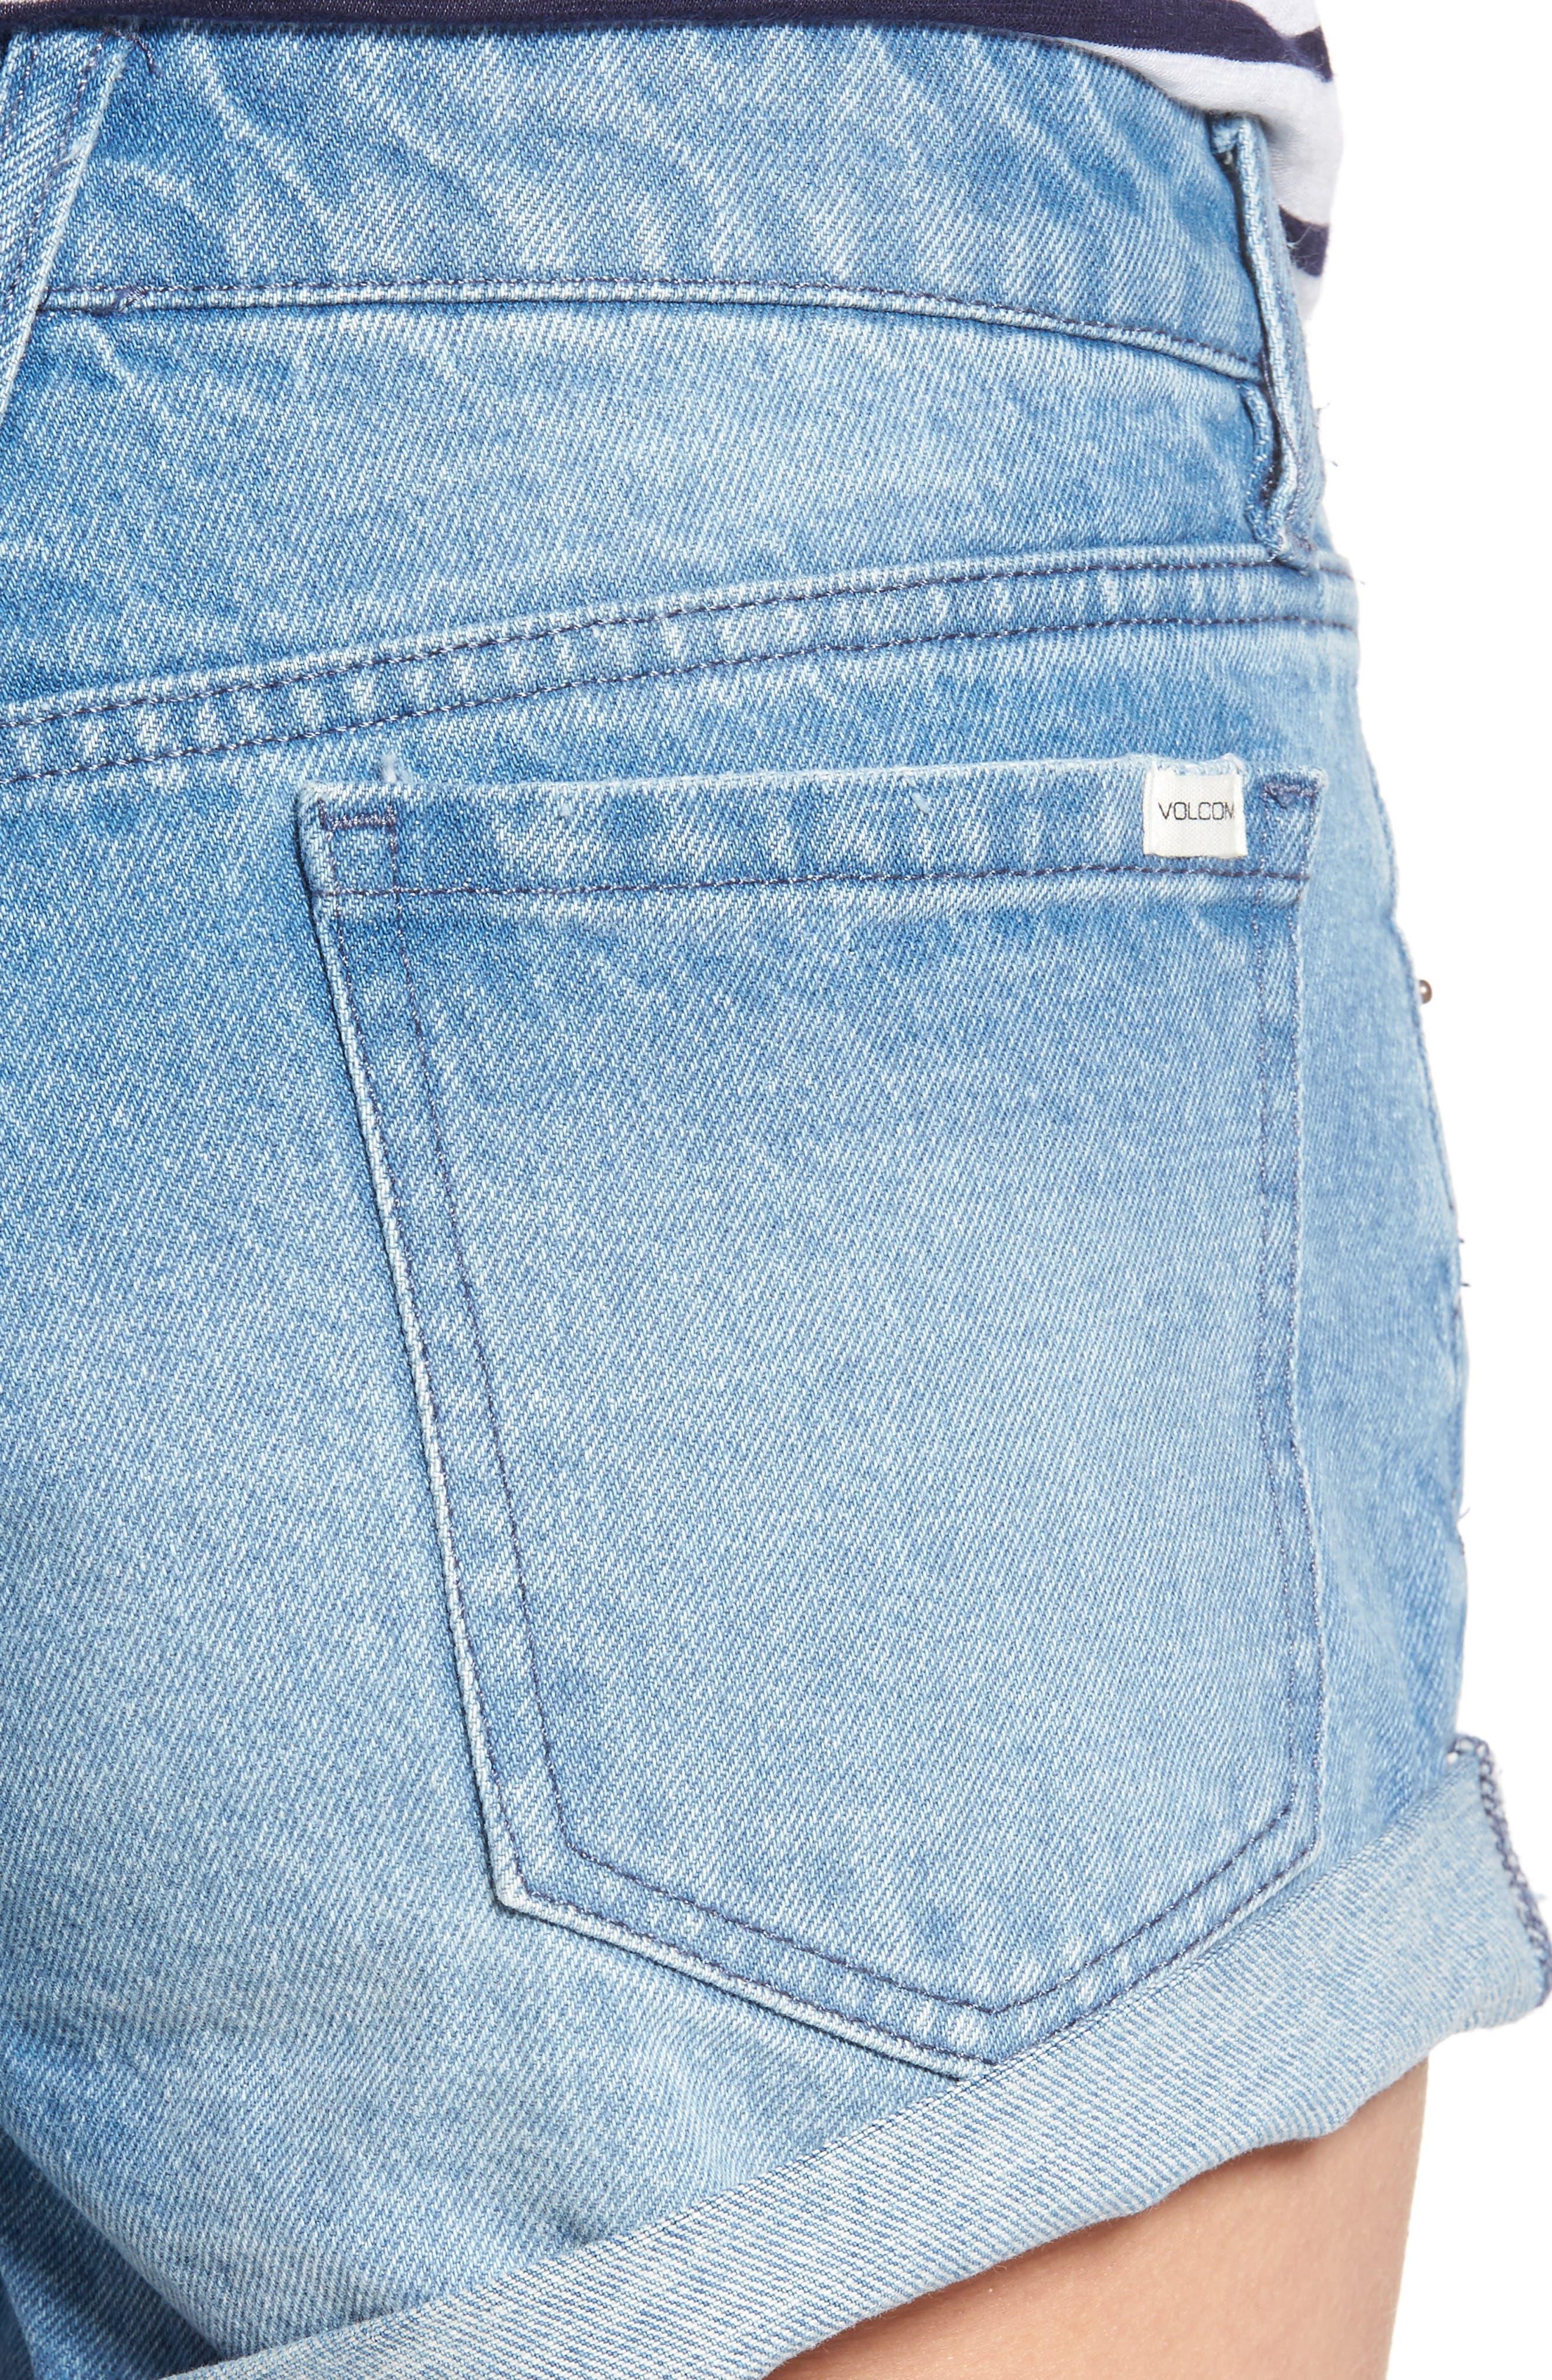 Rolled Denim Shorts,                             Alternate thumbnail 8, color,